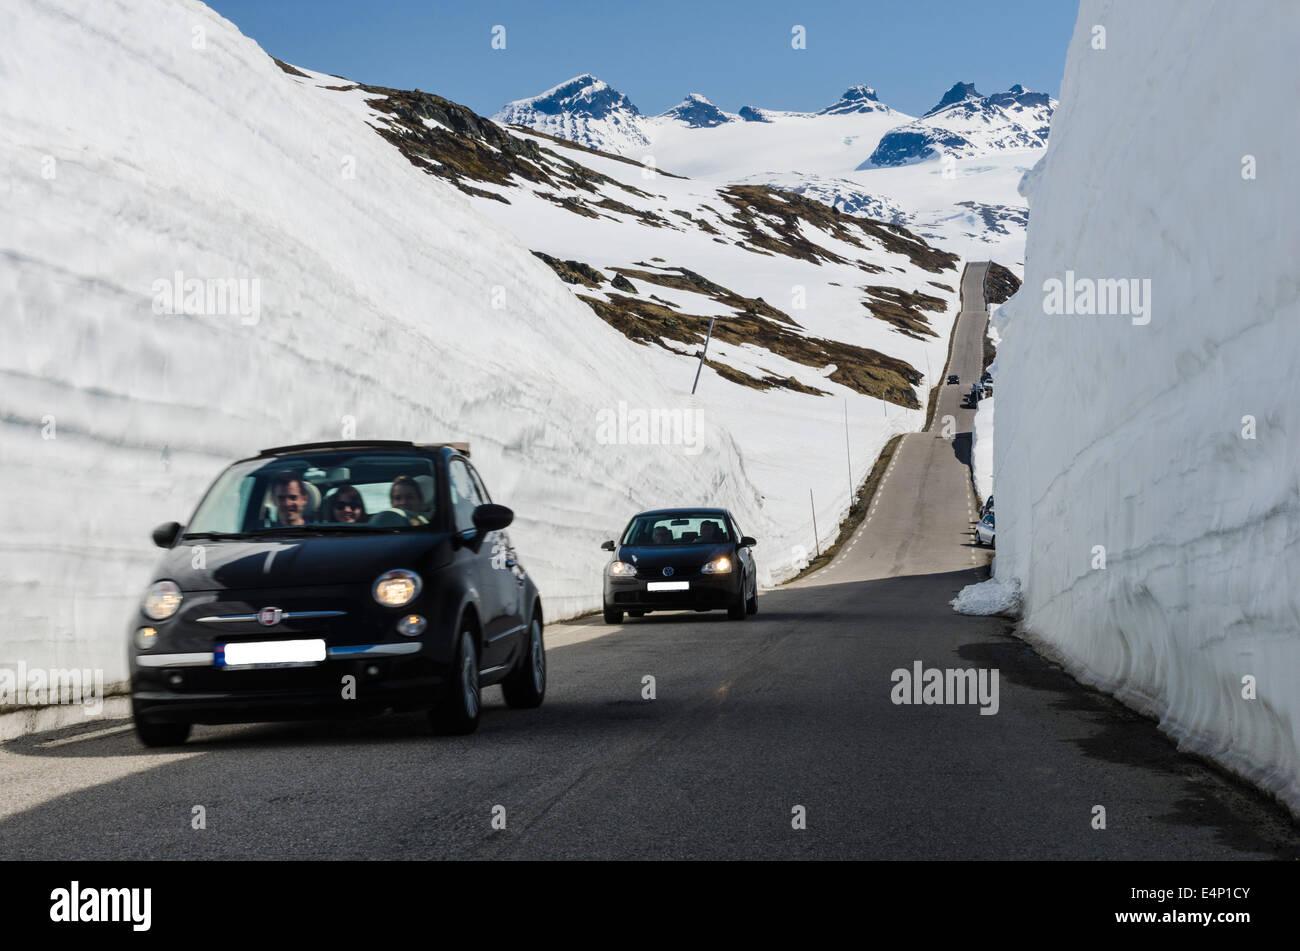 Autos auf dem Sognefjellsvegen, Jotunheimen Nationalpark, Oppland Fylke, Norwegen, - Stock Image